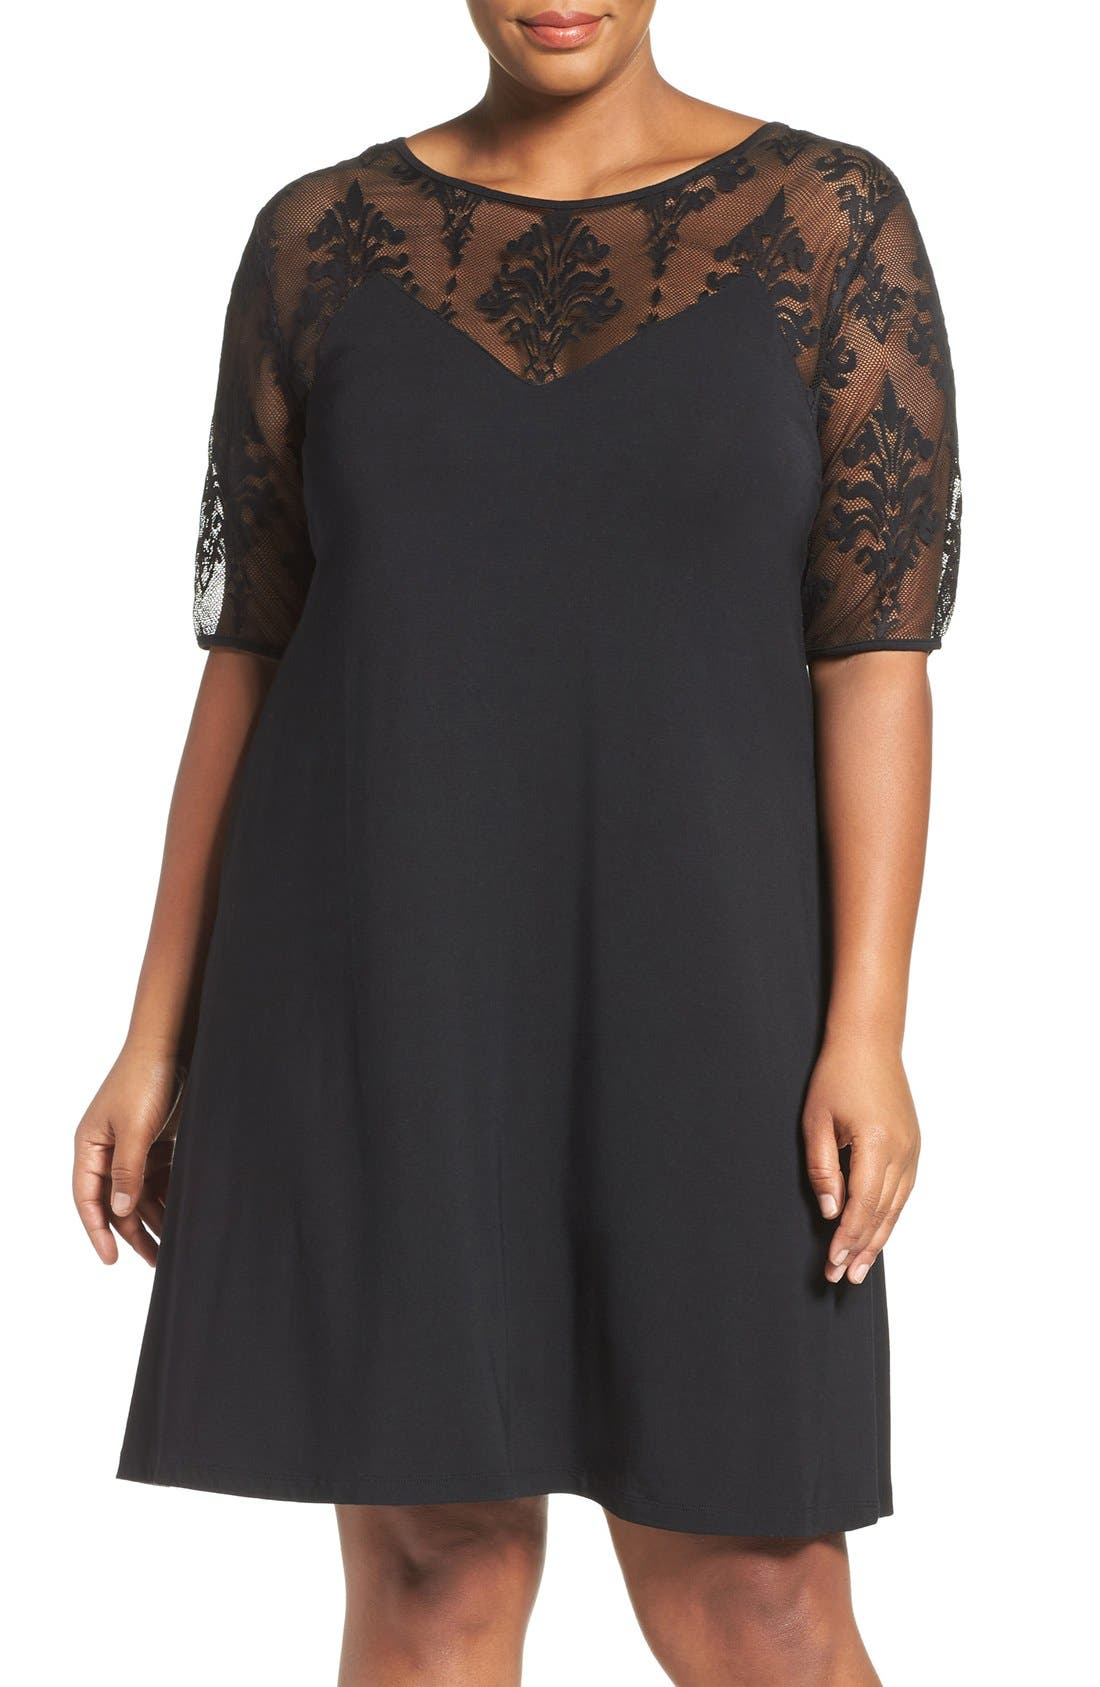 Alternate Image 1 Selected - Tart Jessar Lace Yoke Shift Dress (Plus Size)